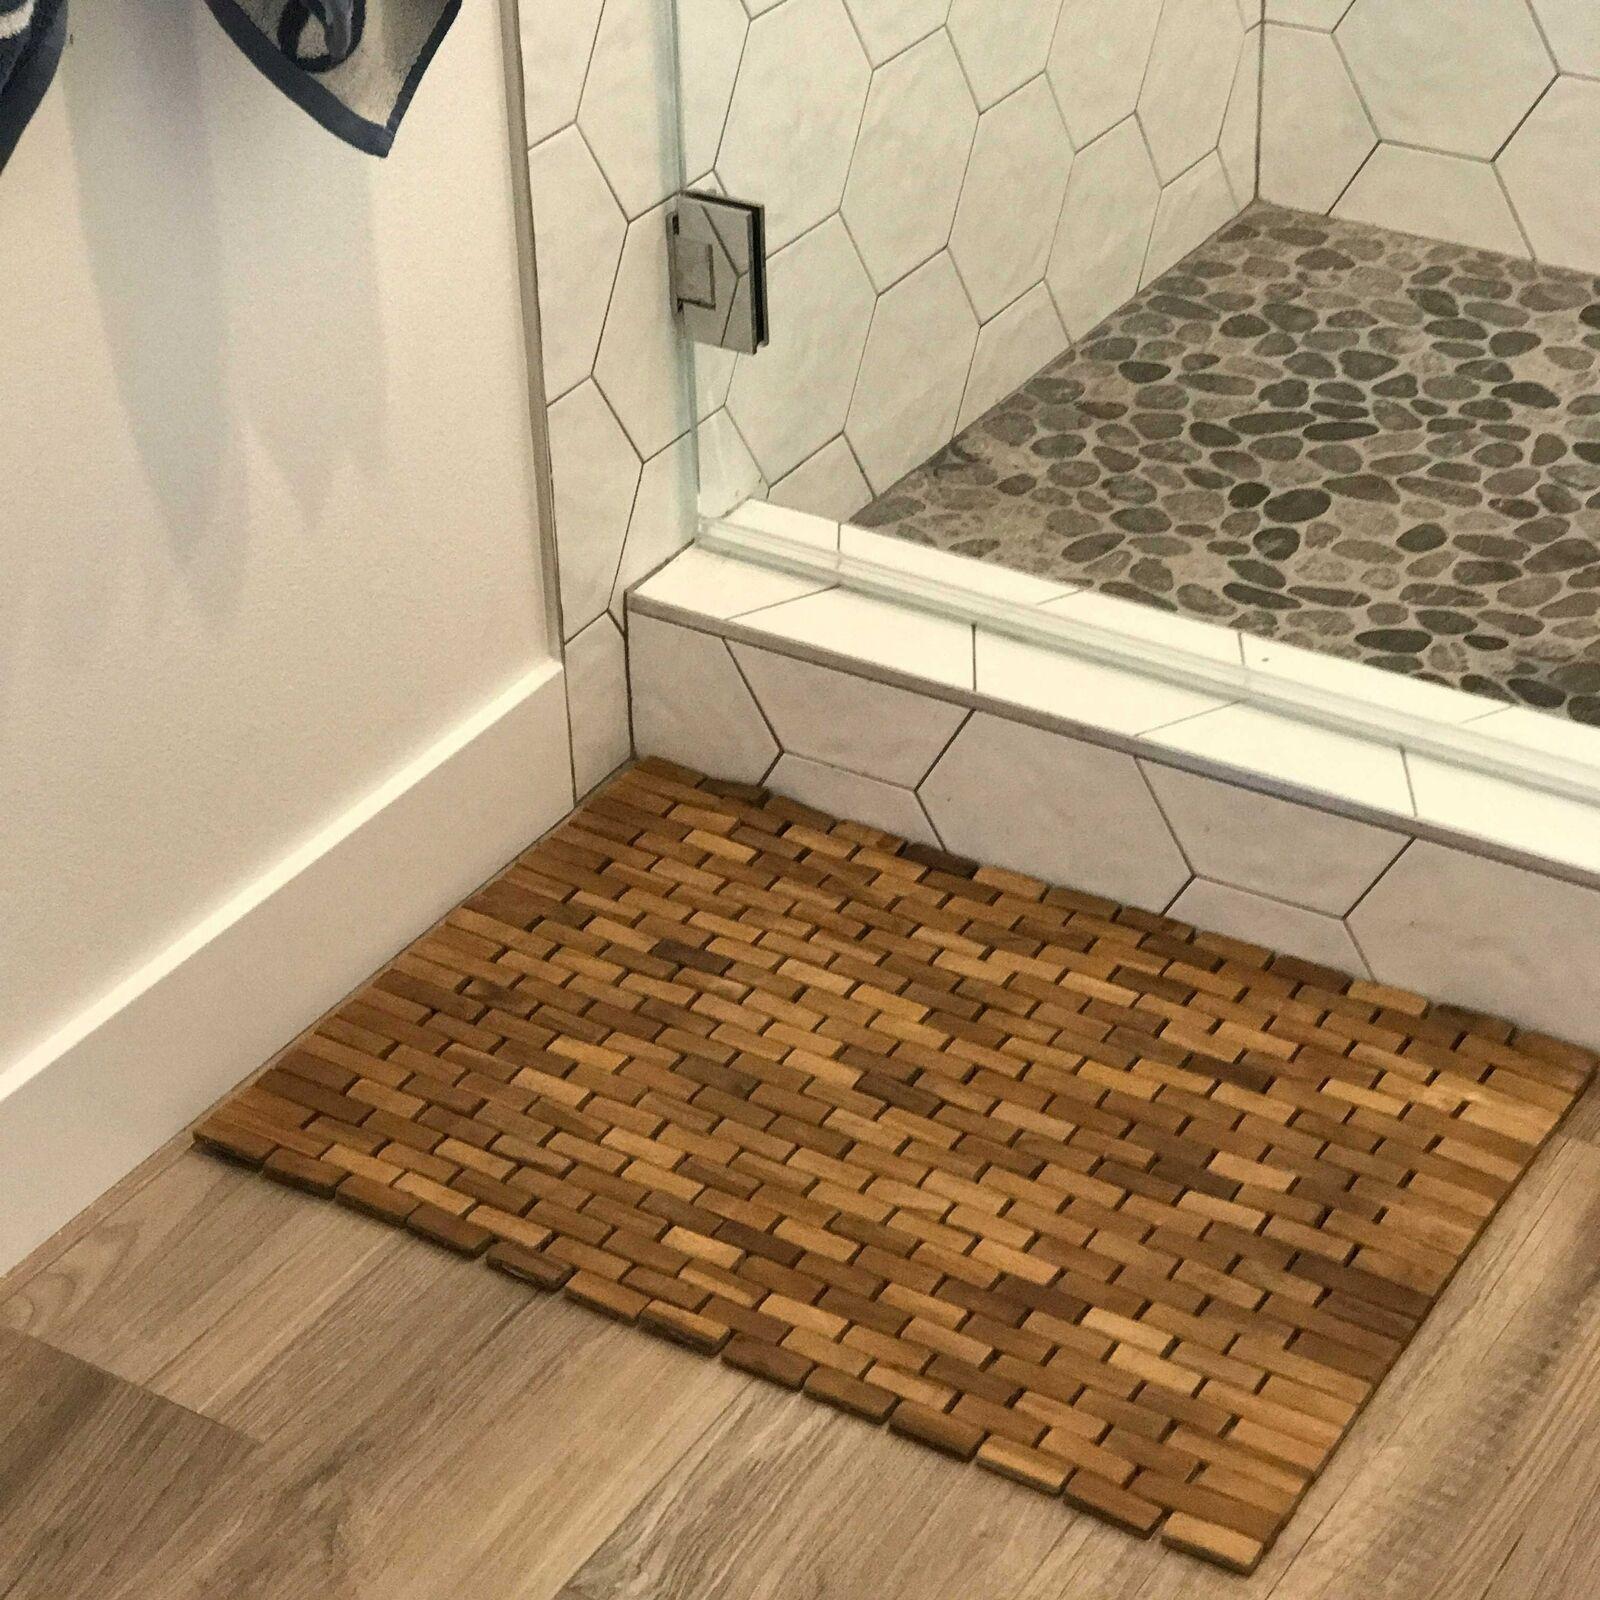 Shower And Floor Mat Hip O Modern Living Foldable Teak Indoor Outdoor Bath Non Slip Appliques Mats